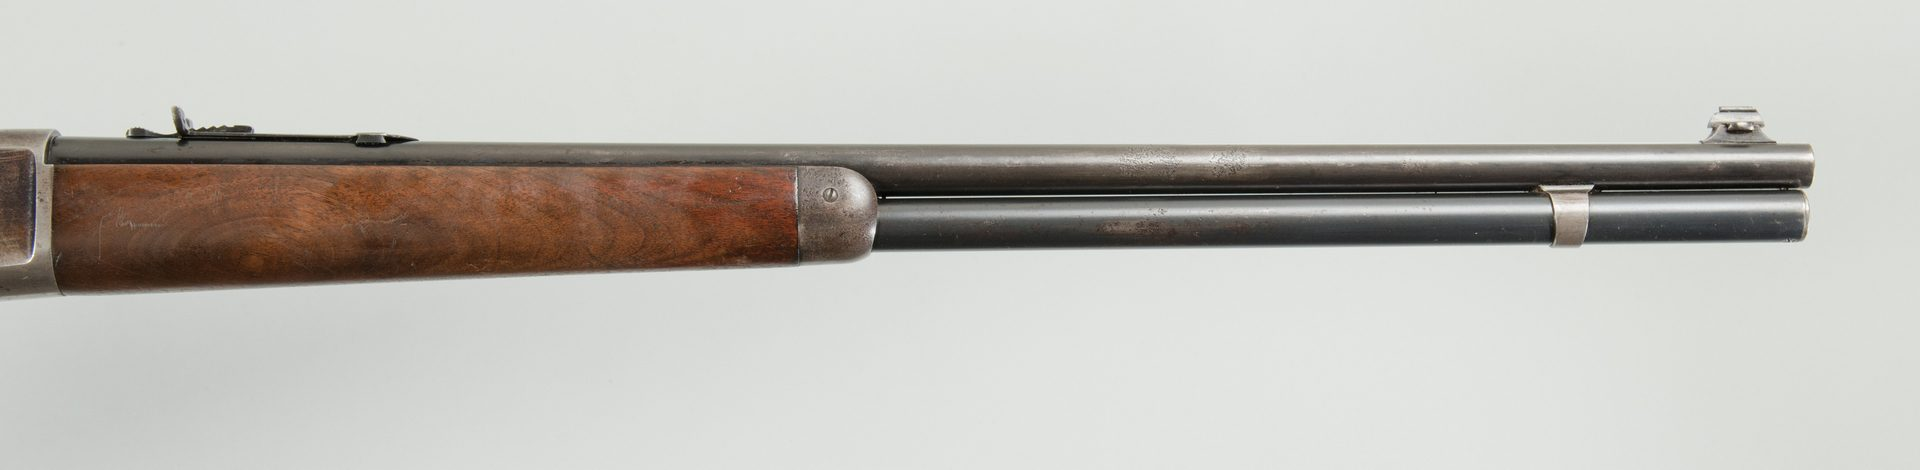 Lot 804: Winchester Model 1886 Lightweight Rifle .33 Win